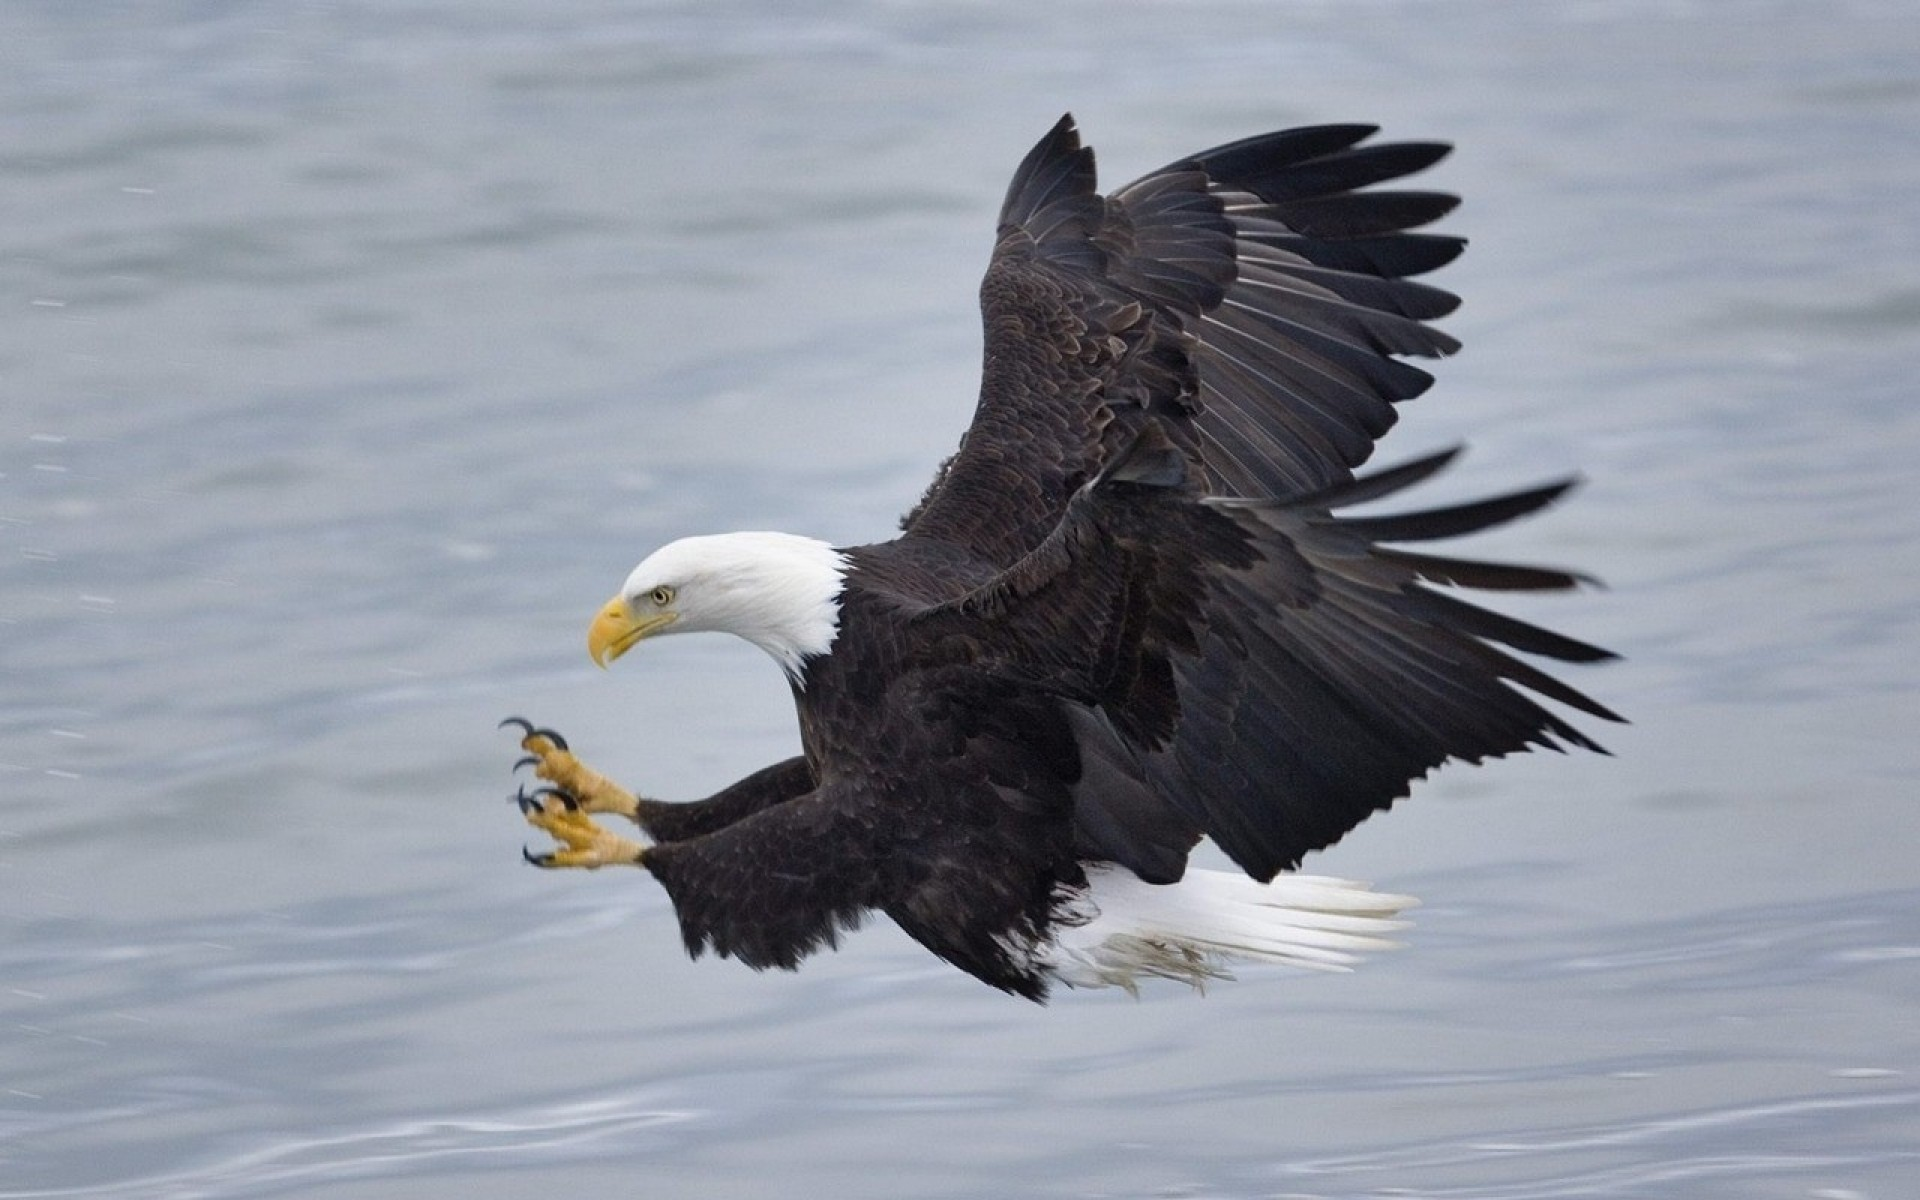 … Bald Eagle Widescreen Wallpaper